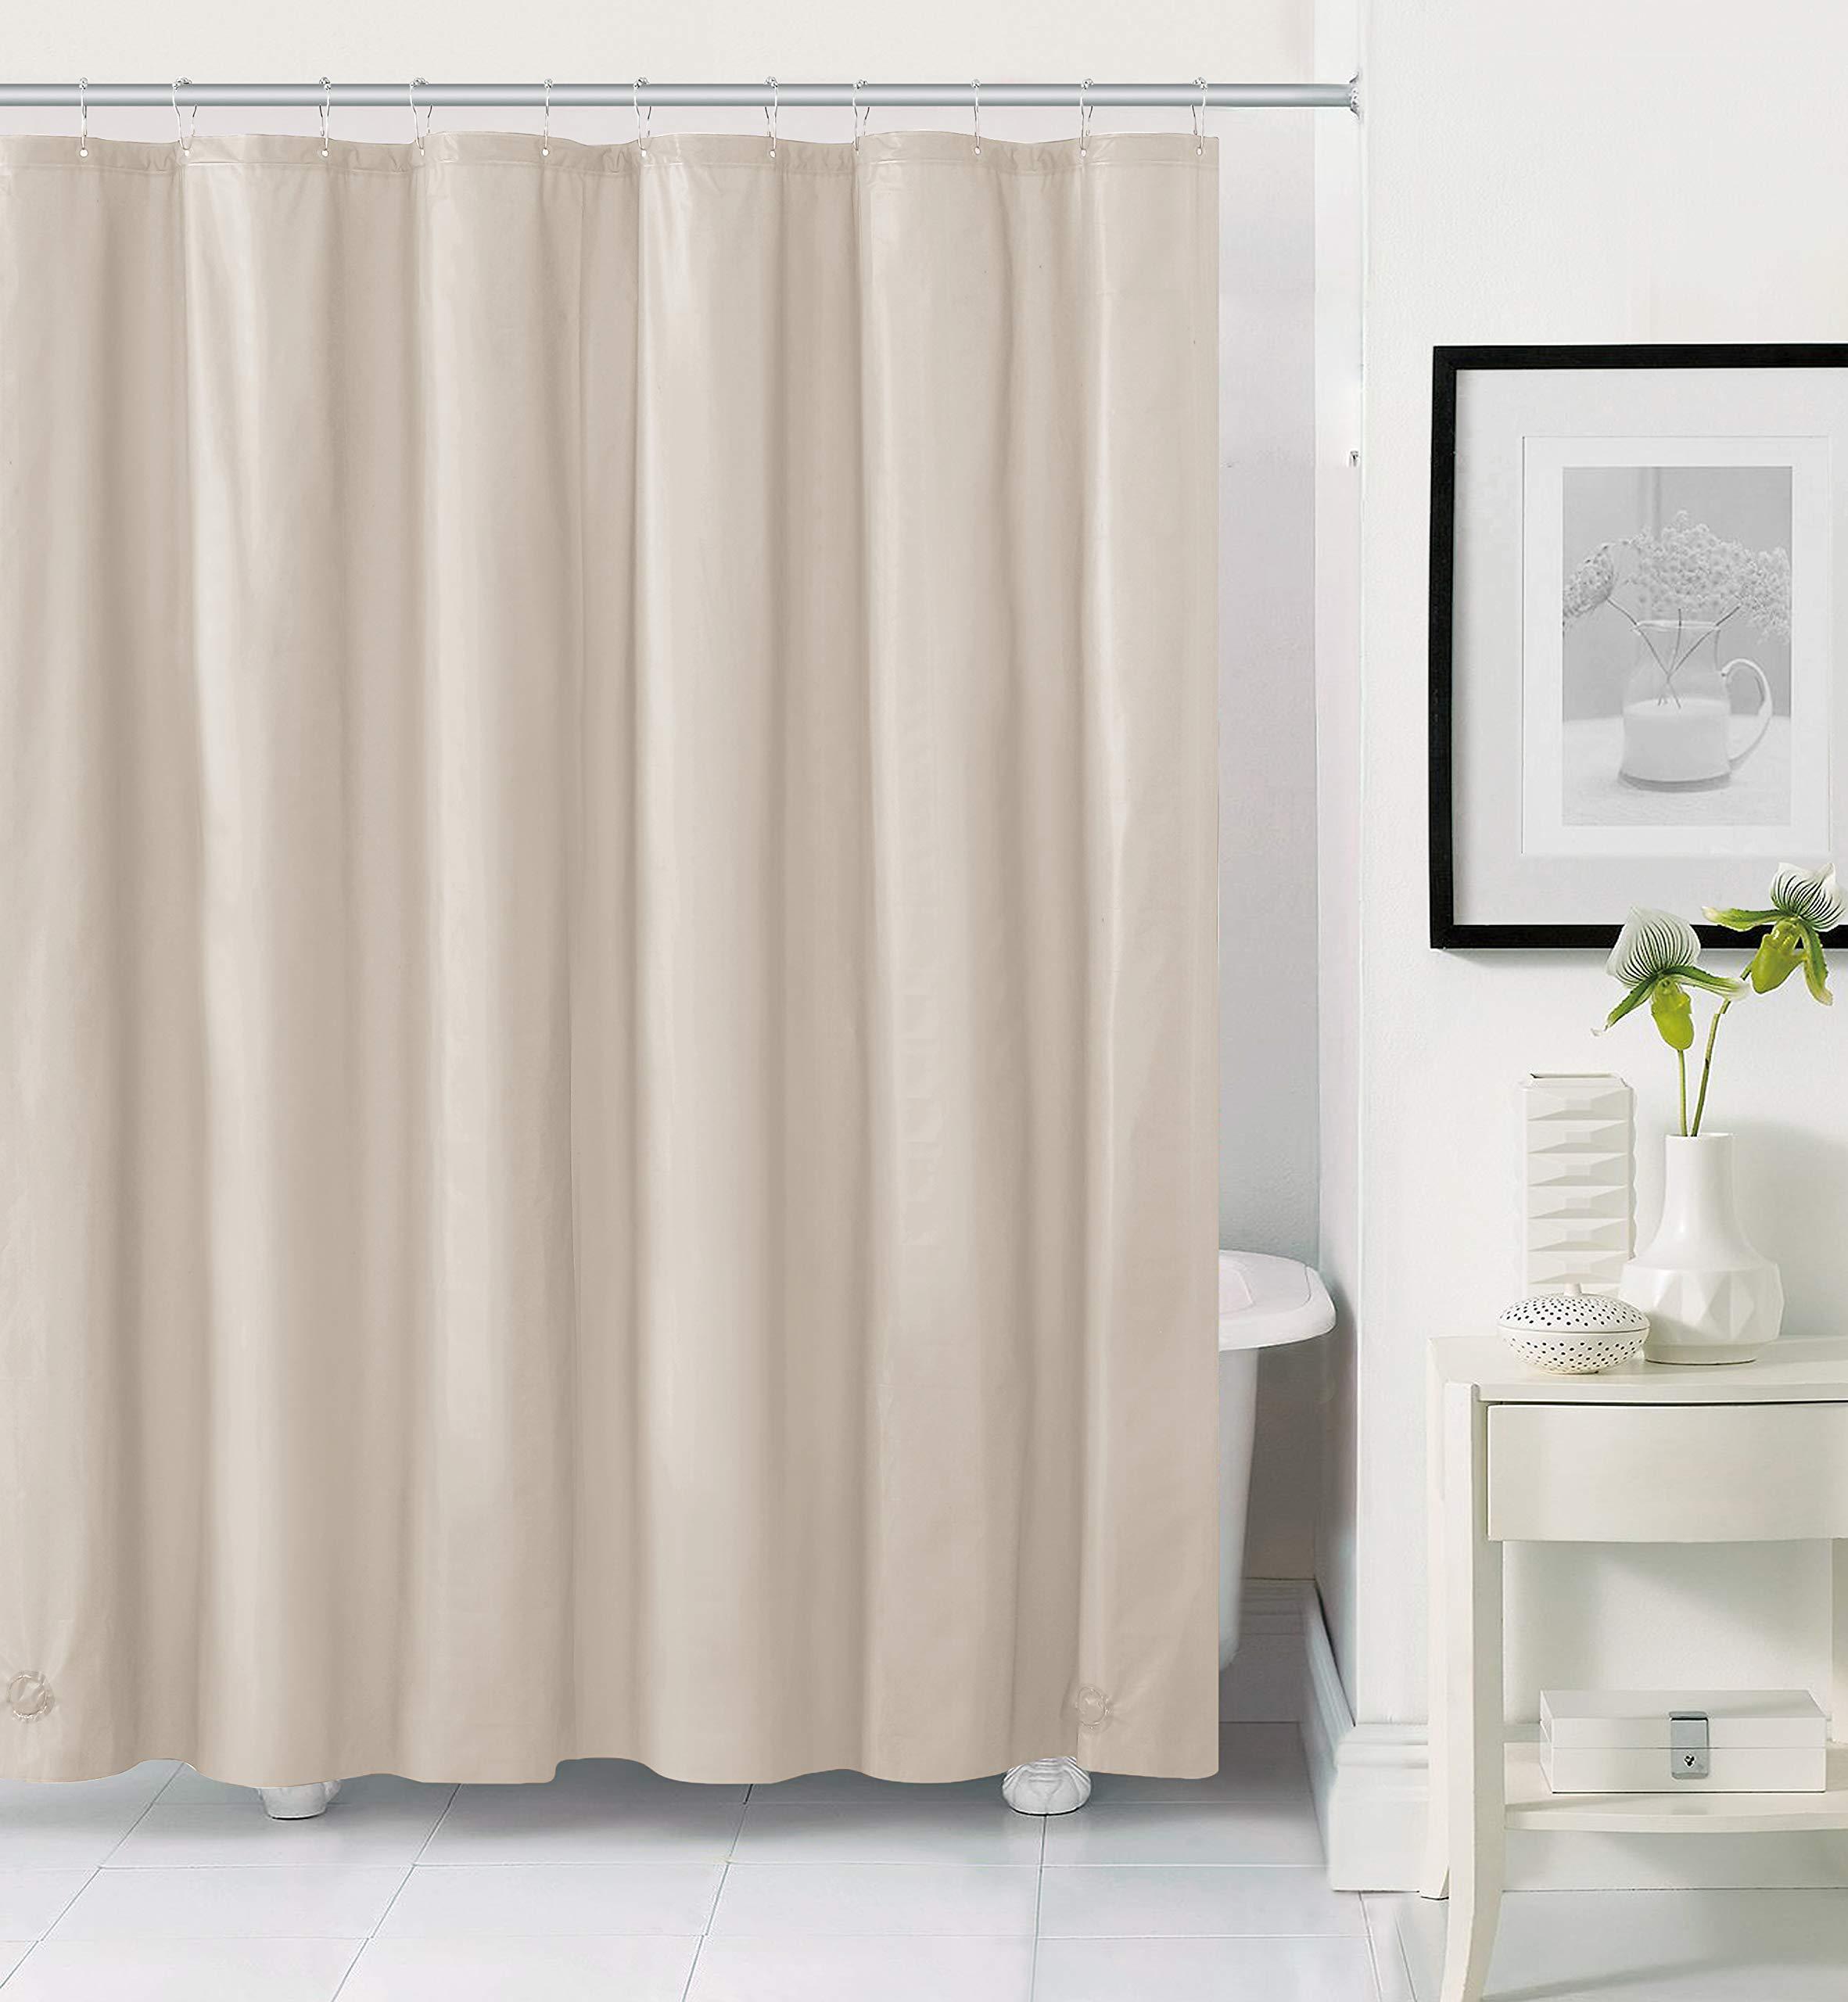 GoodGram Hotel Premium PEVA Shower Curtain Liner with Rust Proof Metal Grommets - Assorted Colors (Ivory/Beige)